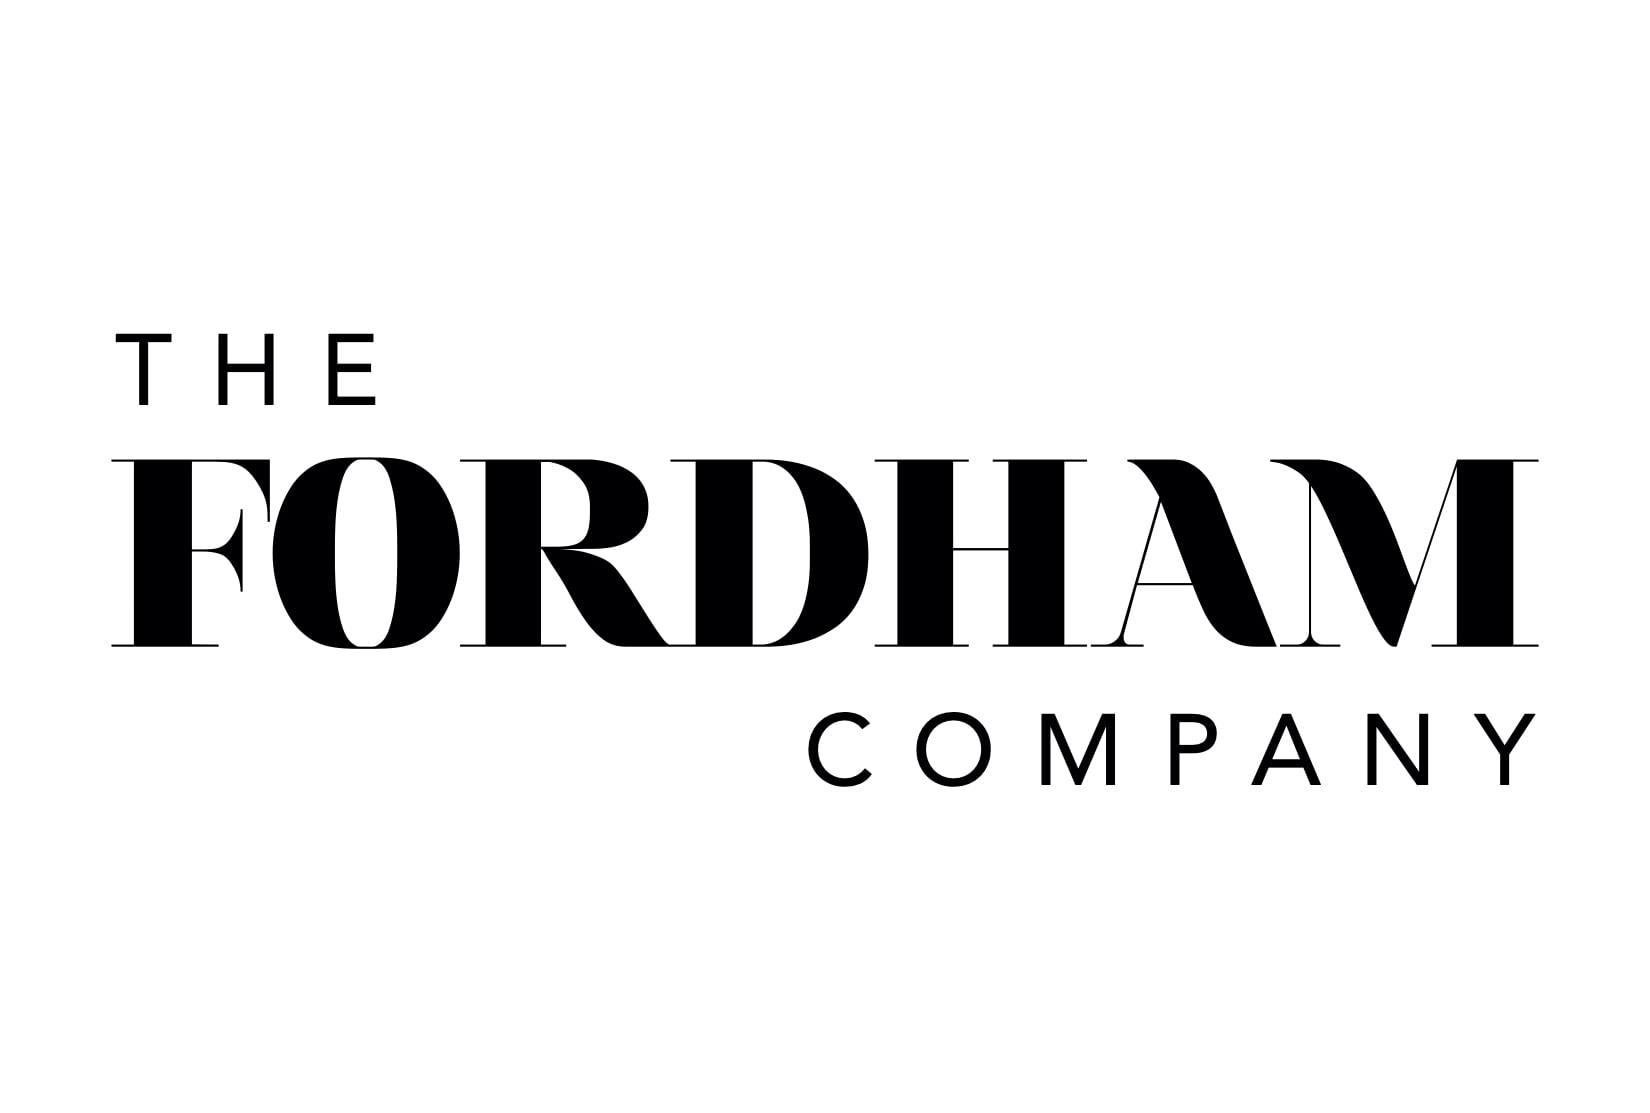 FORDHAM_logo_2